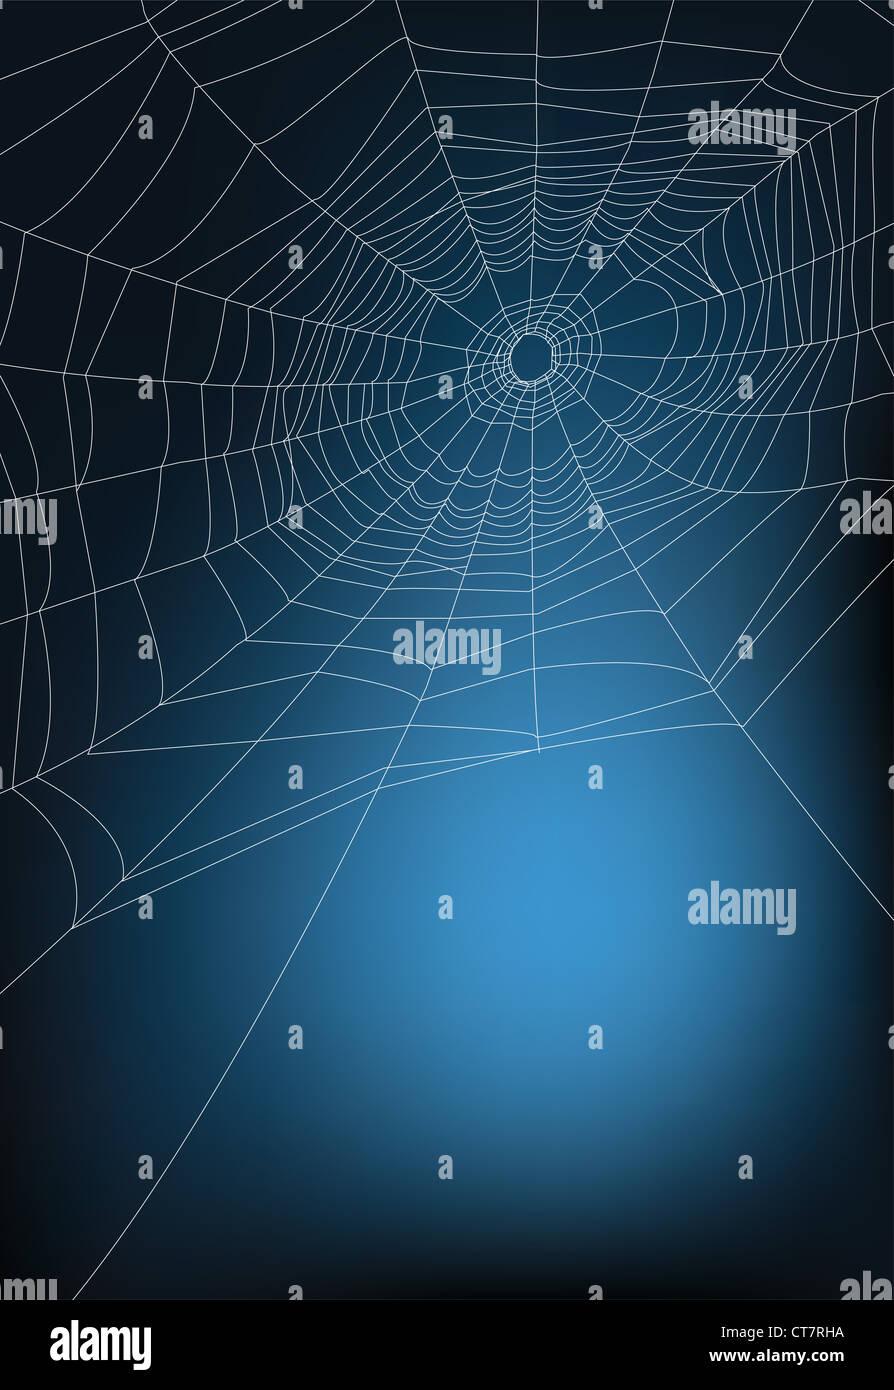 spider web illustration, for background. - Stock Image